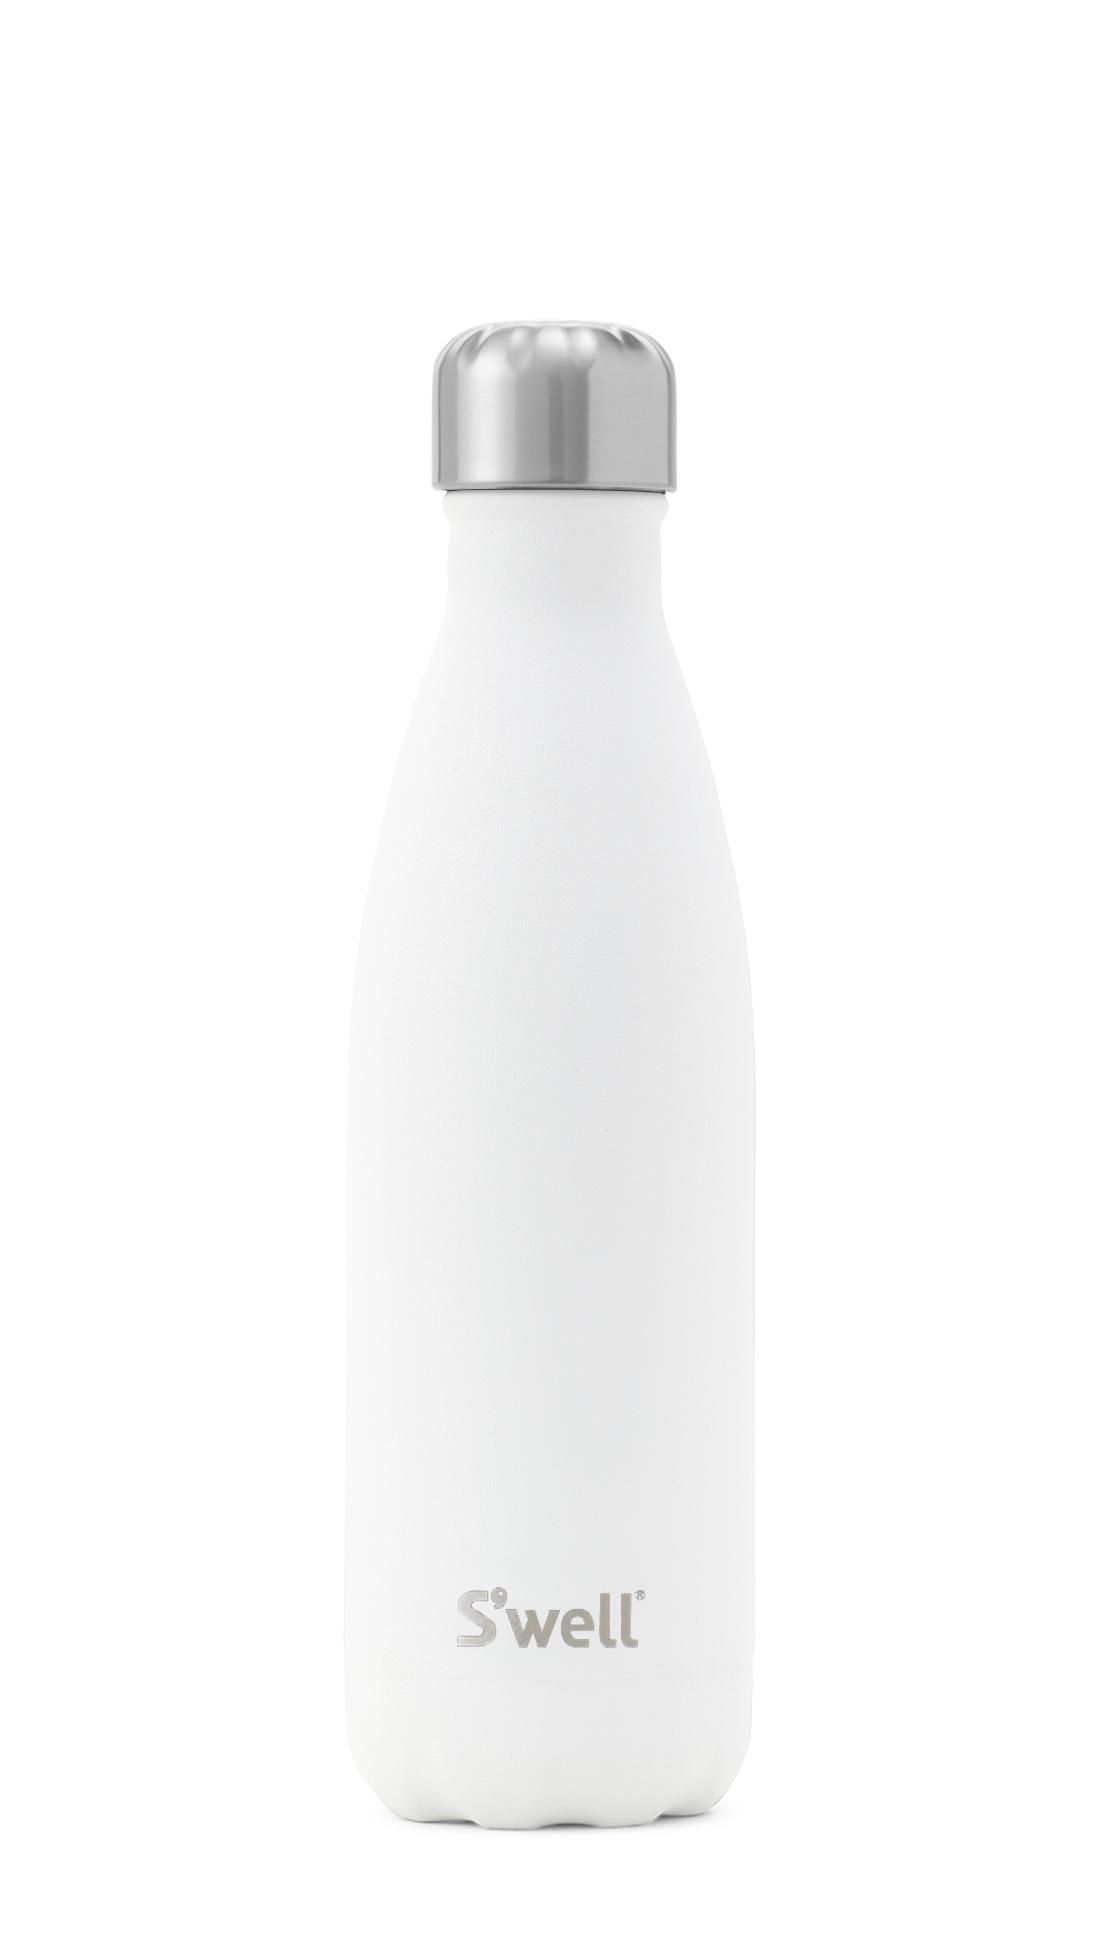 Commuter guide guide water bottle